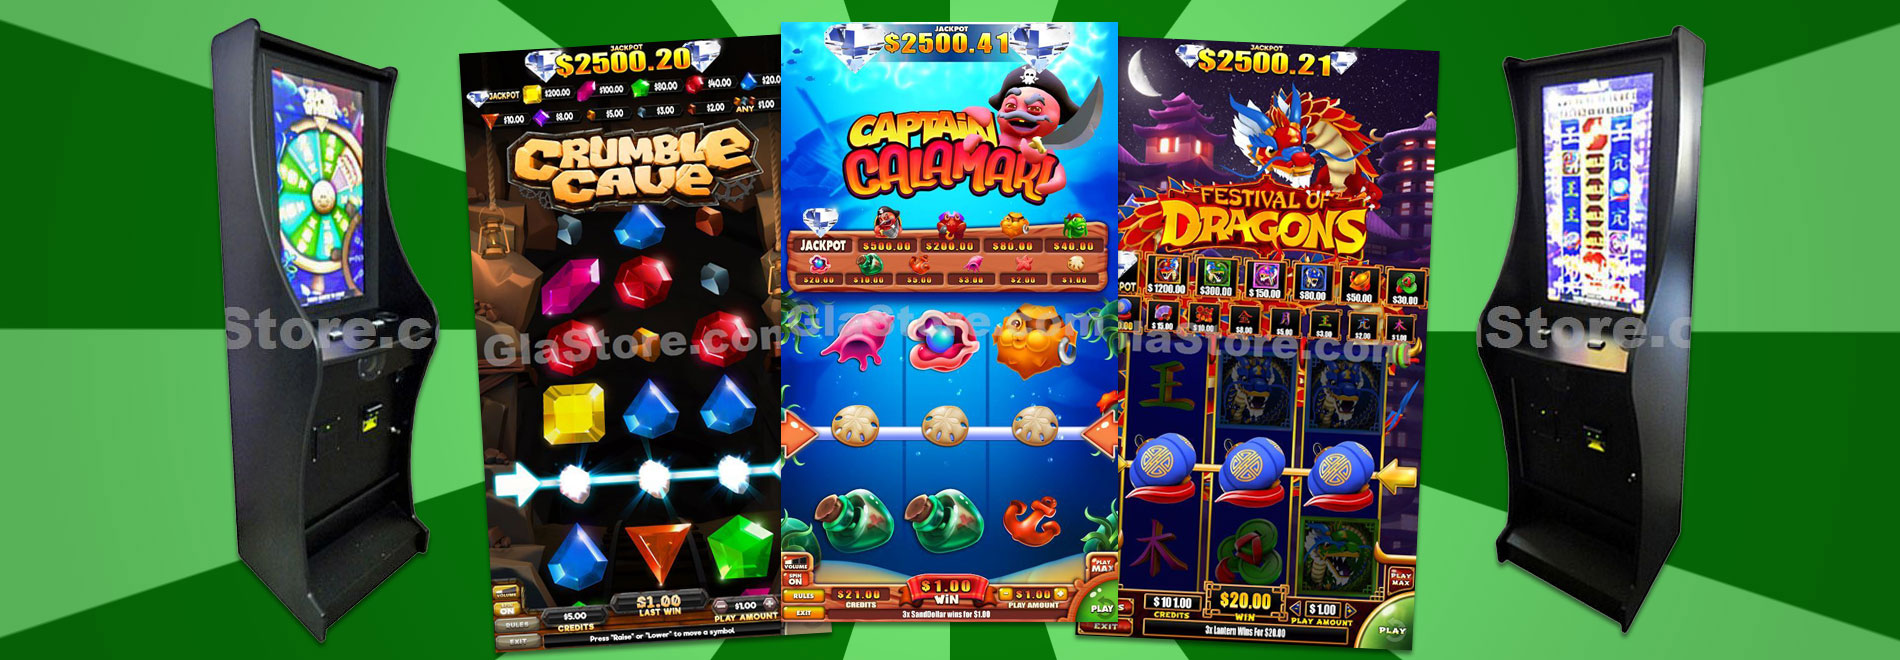 New Diamond Skill Games